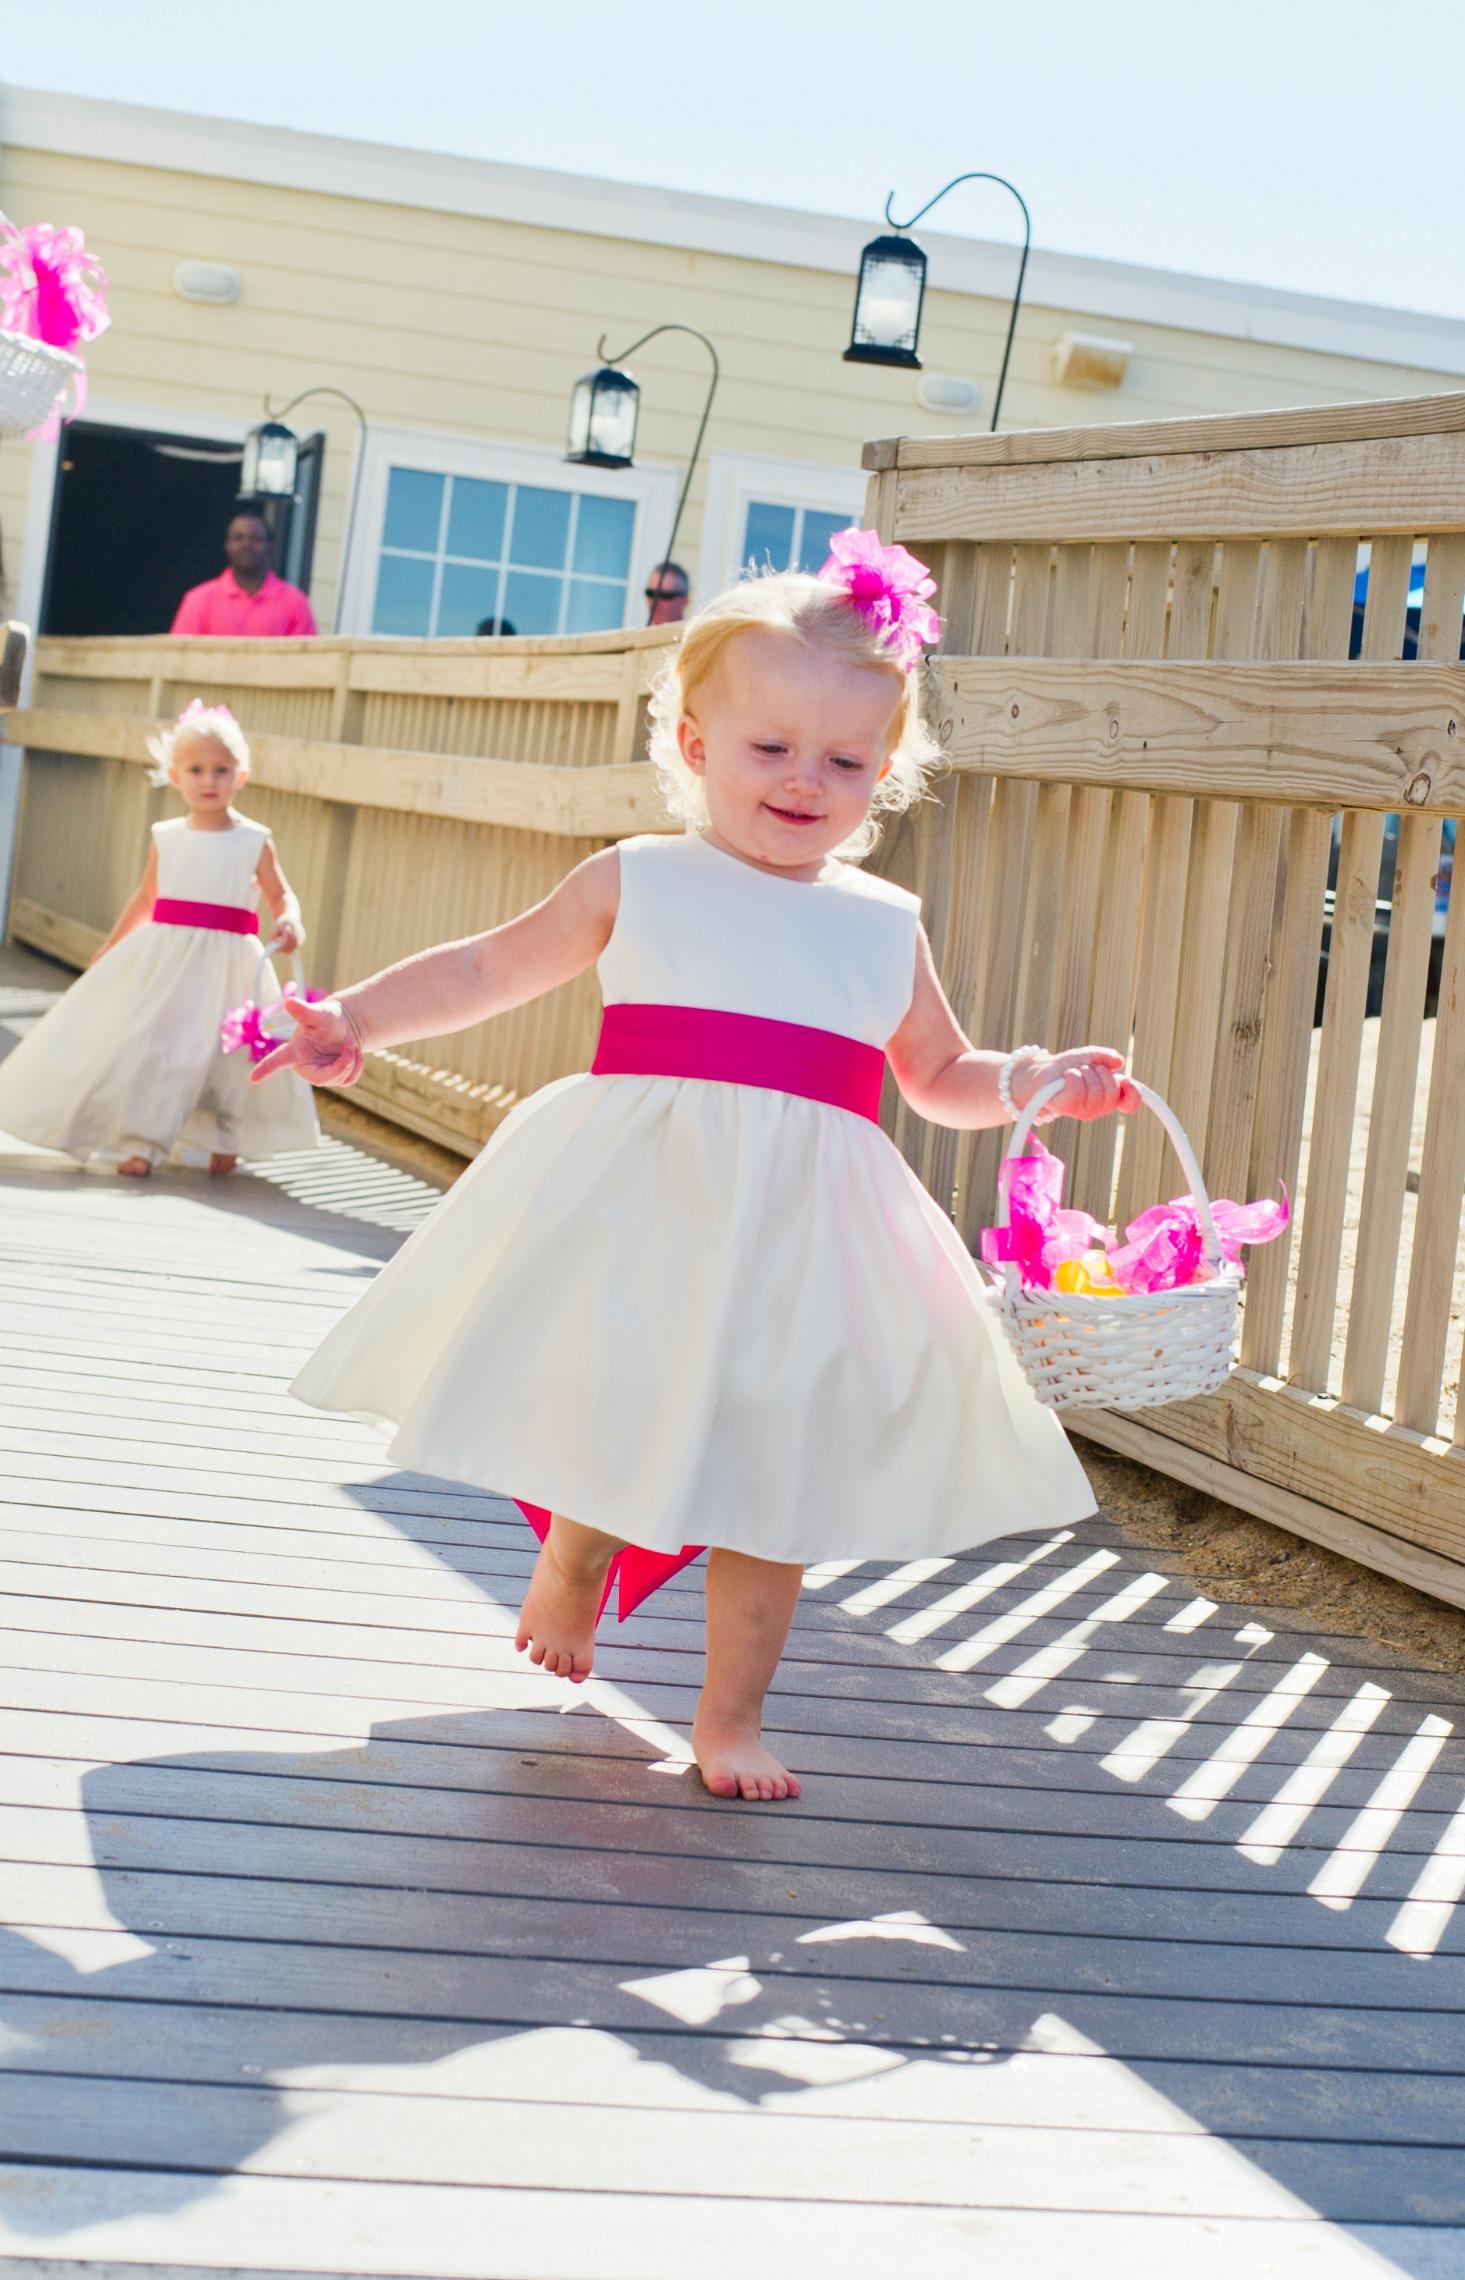 Plan a beach wedding on a budget